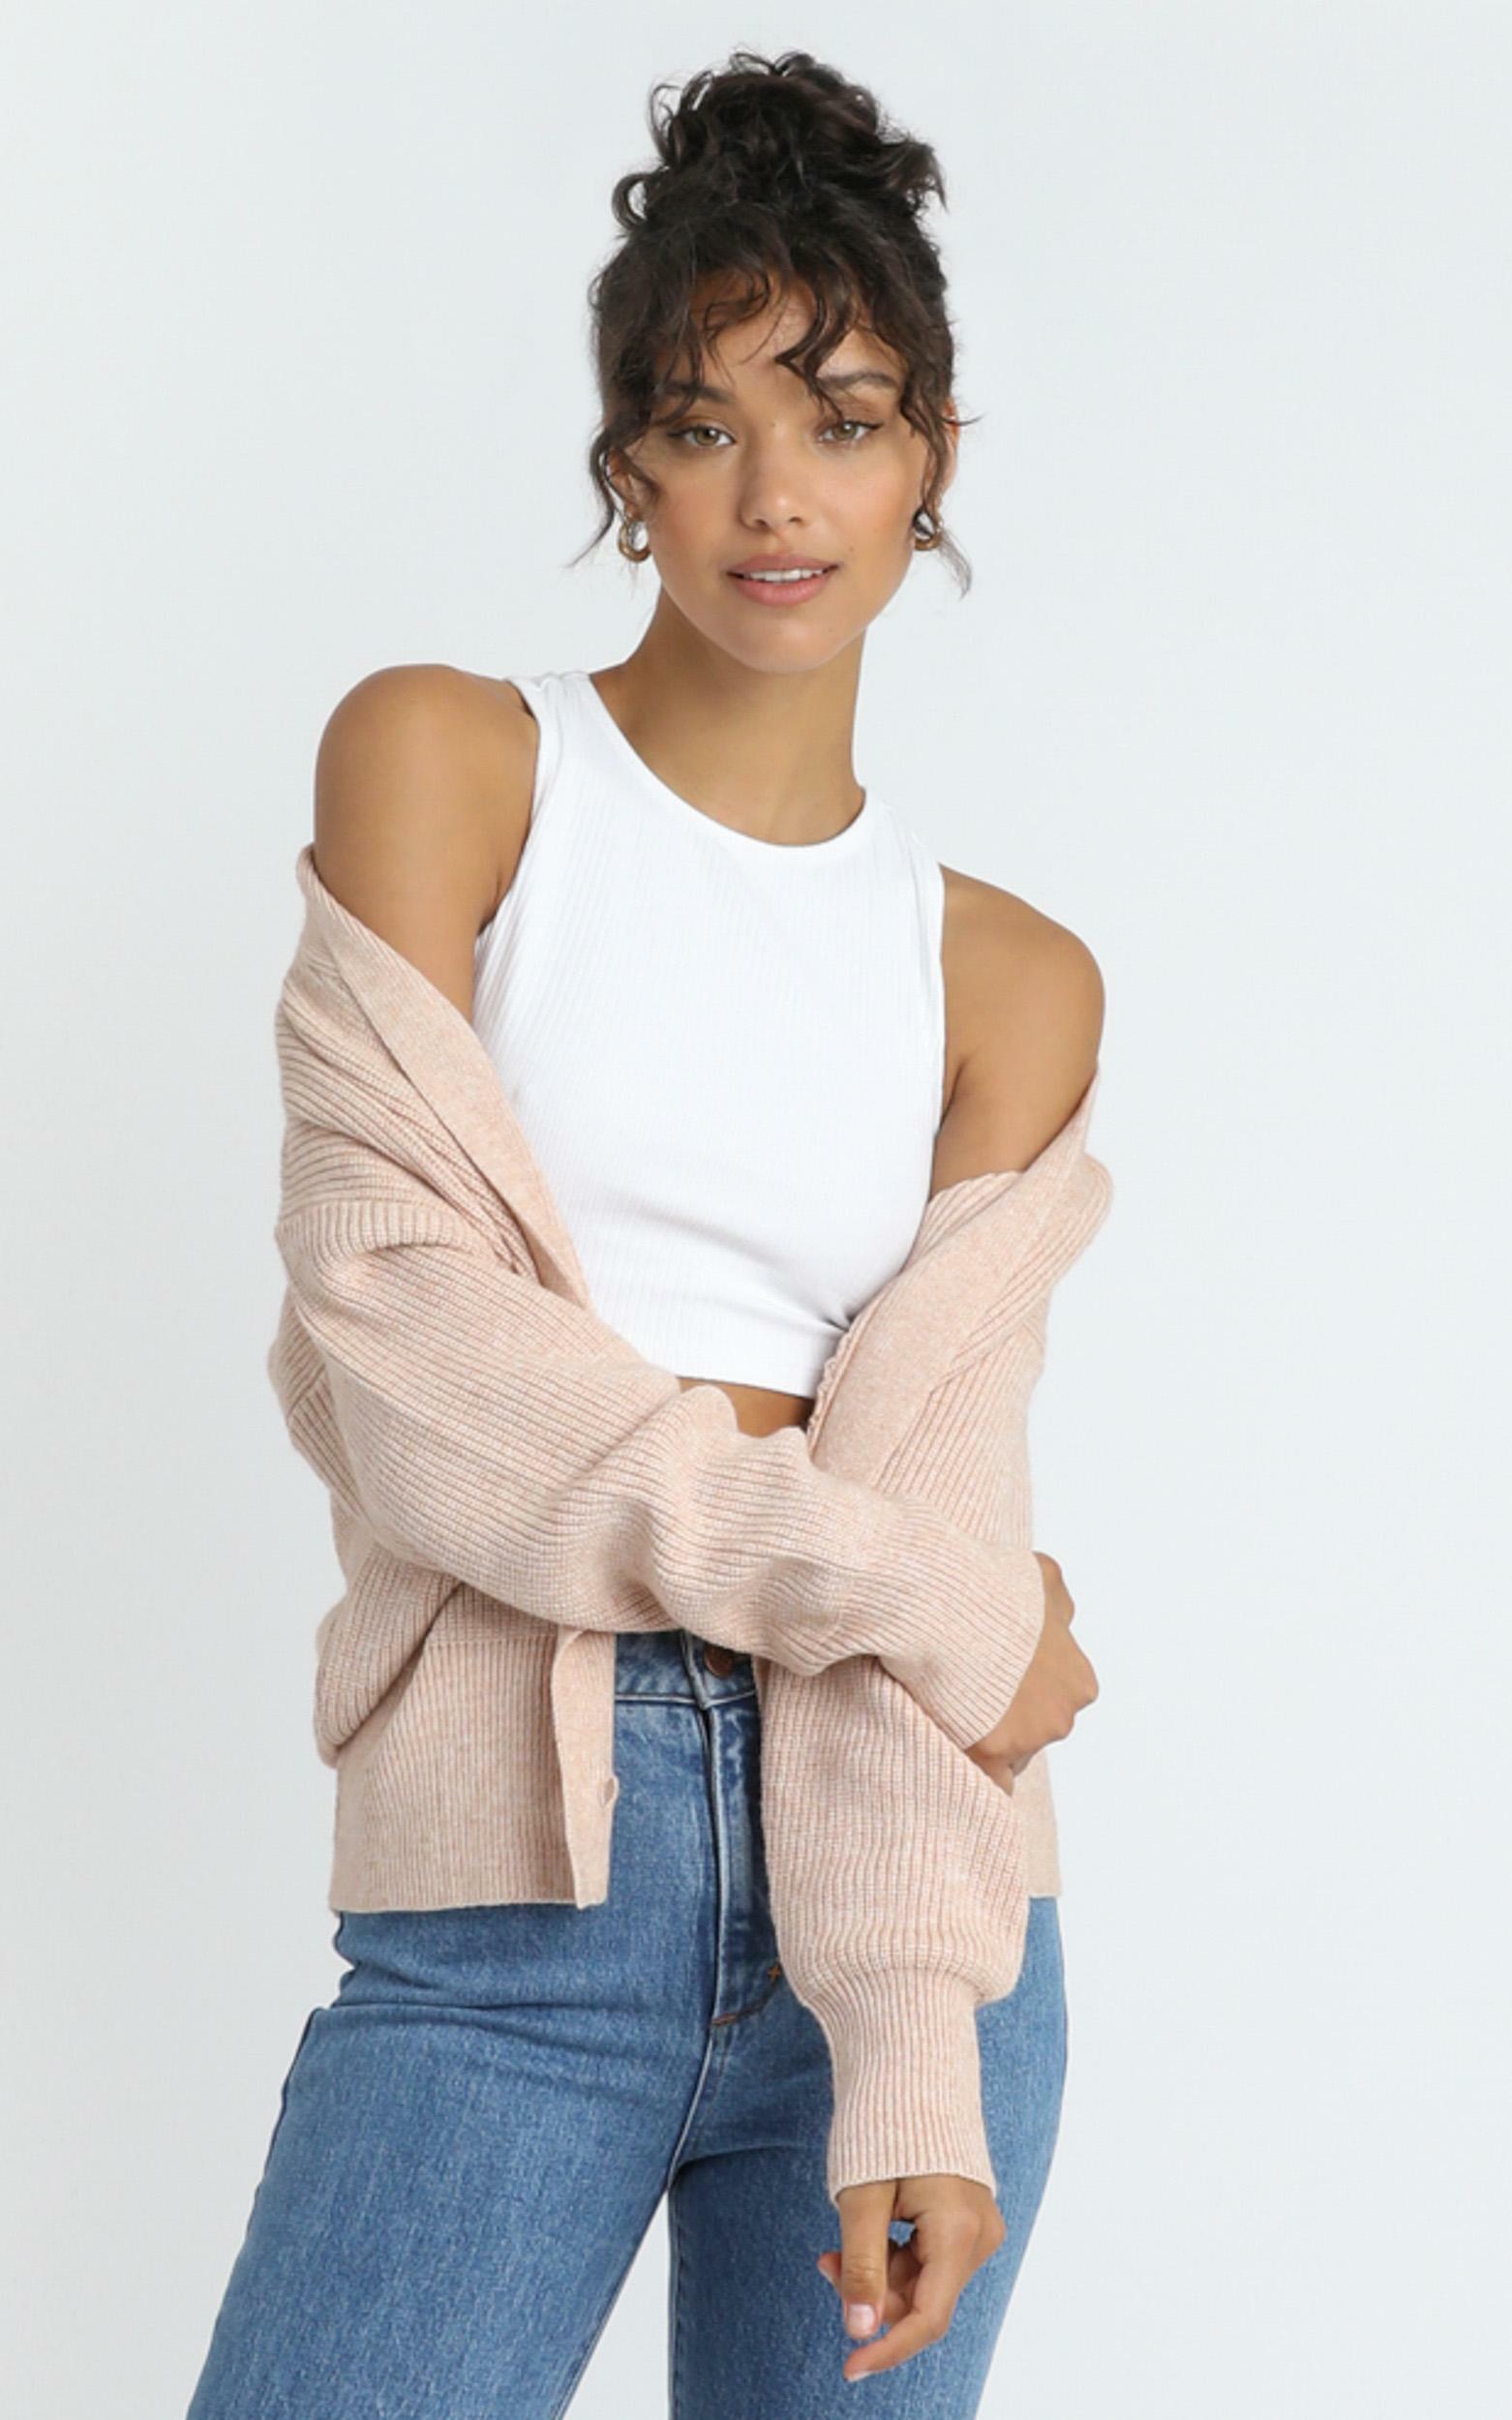 Original Trendsetter Knit Cardigan in Blush - S/M, Blush, hi-res image number null